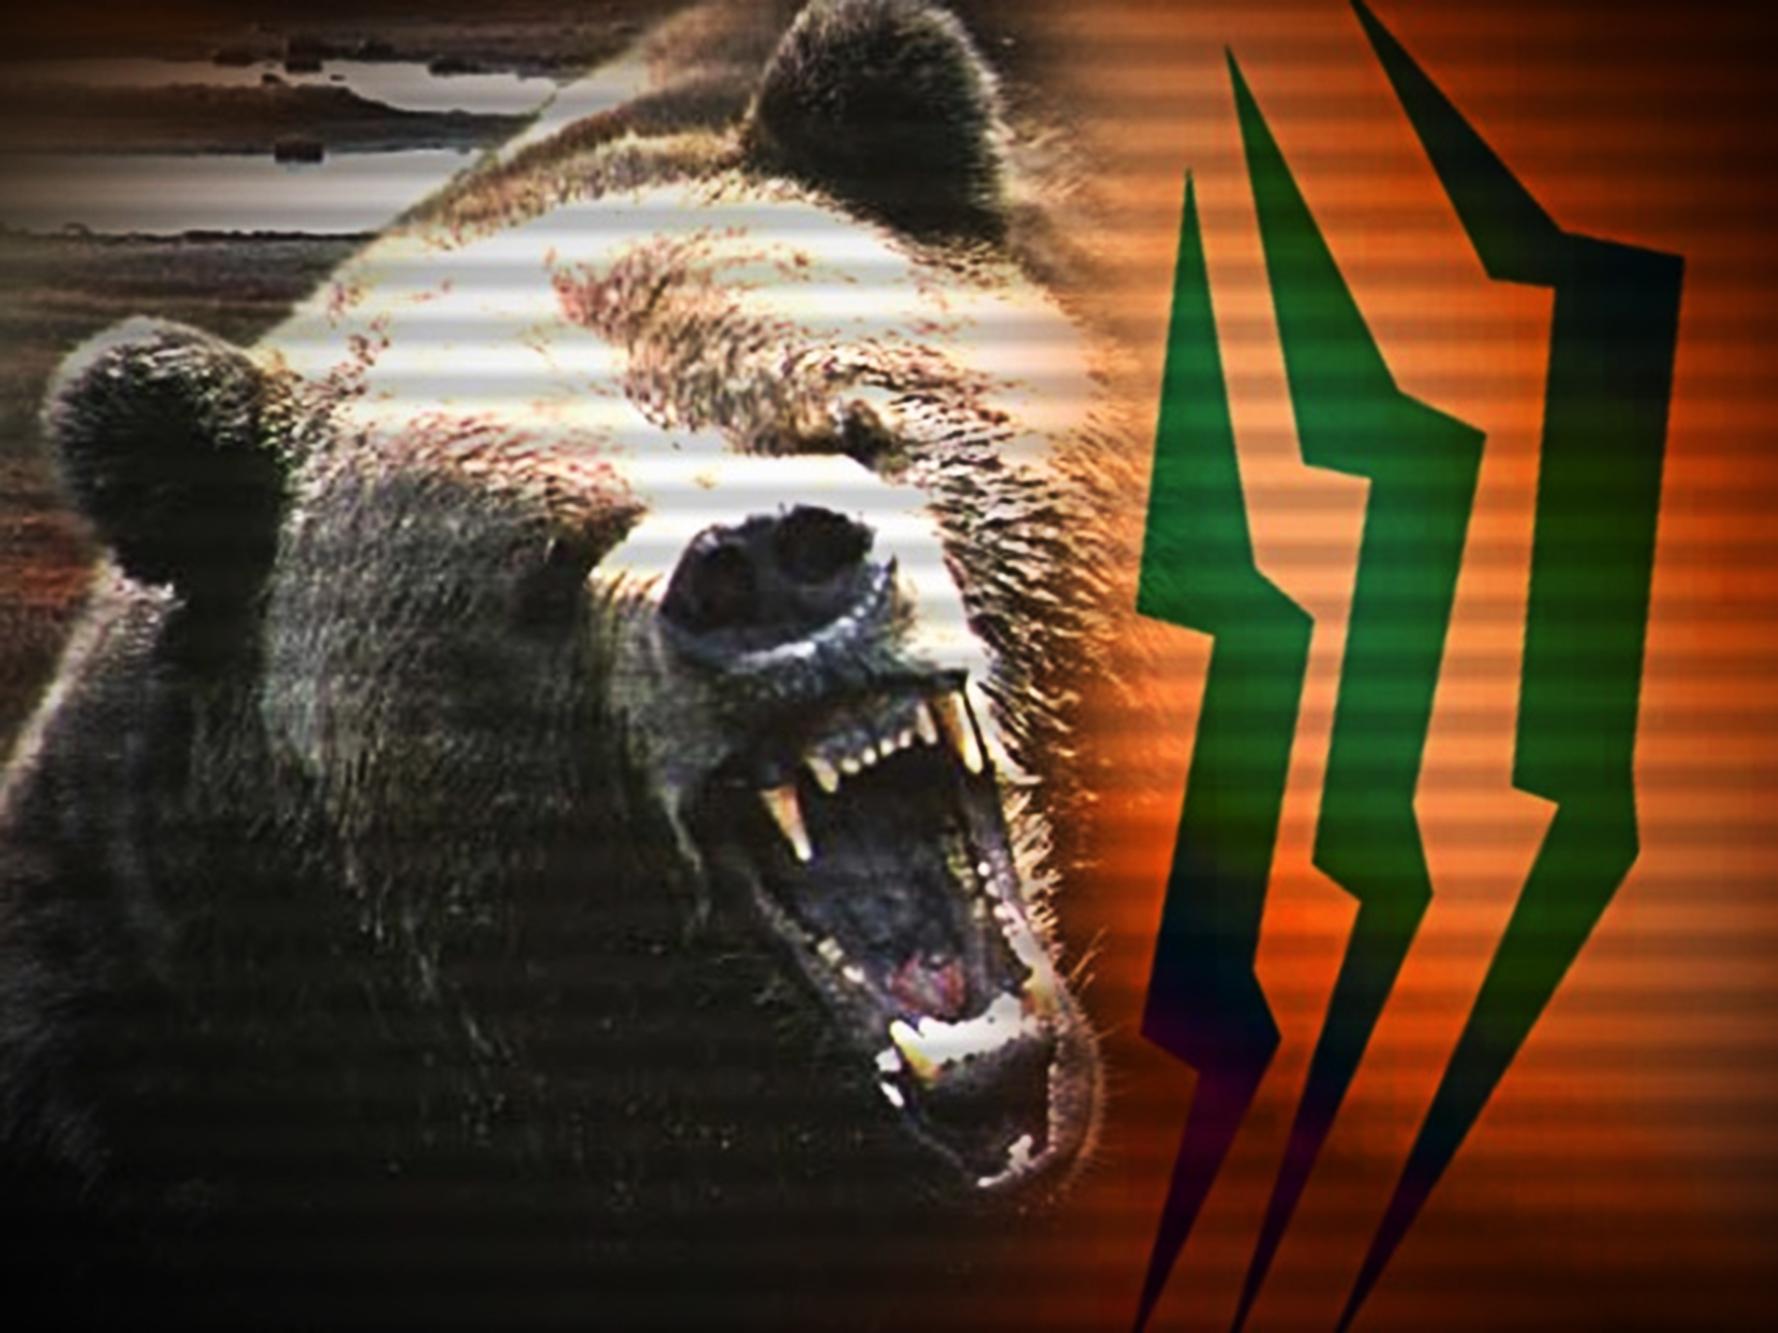 BearAttack_1550087185387.jpg